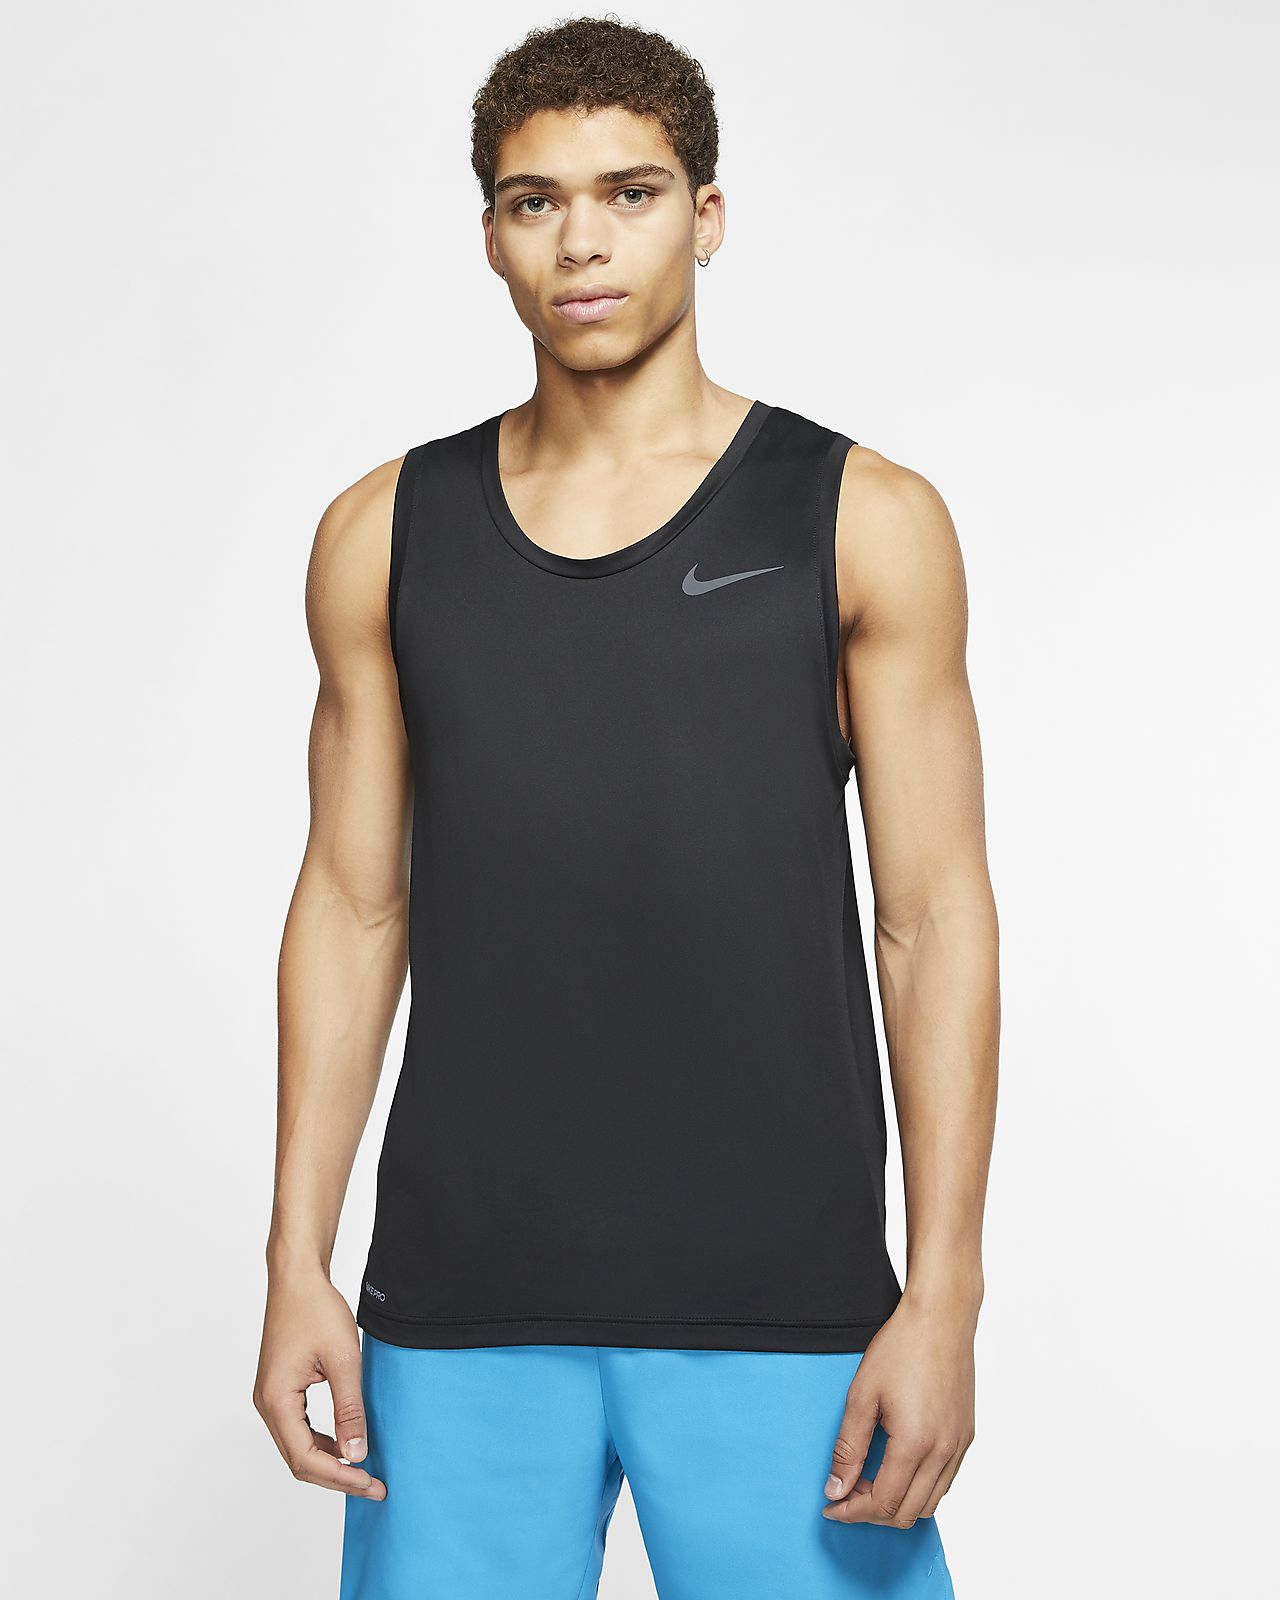 Nike Pro Camiseta de tirantes Hombre